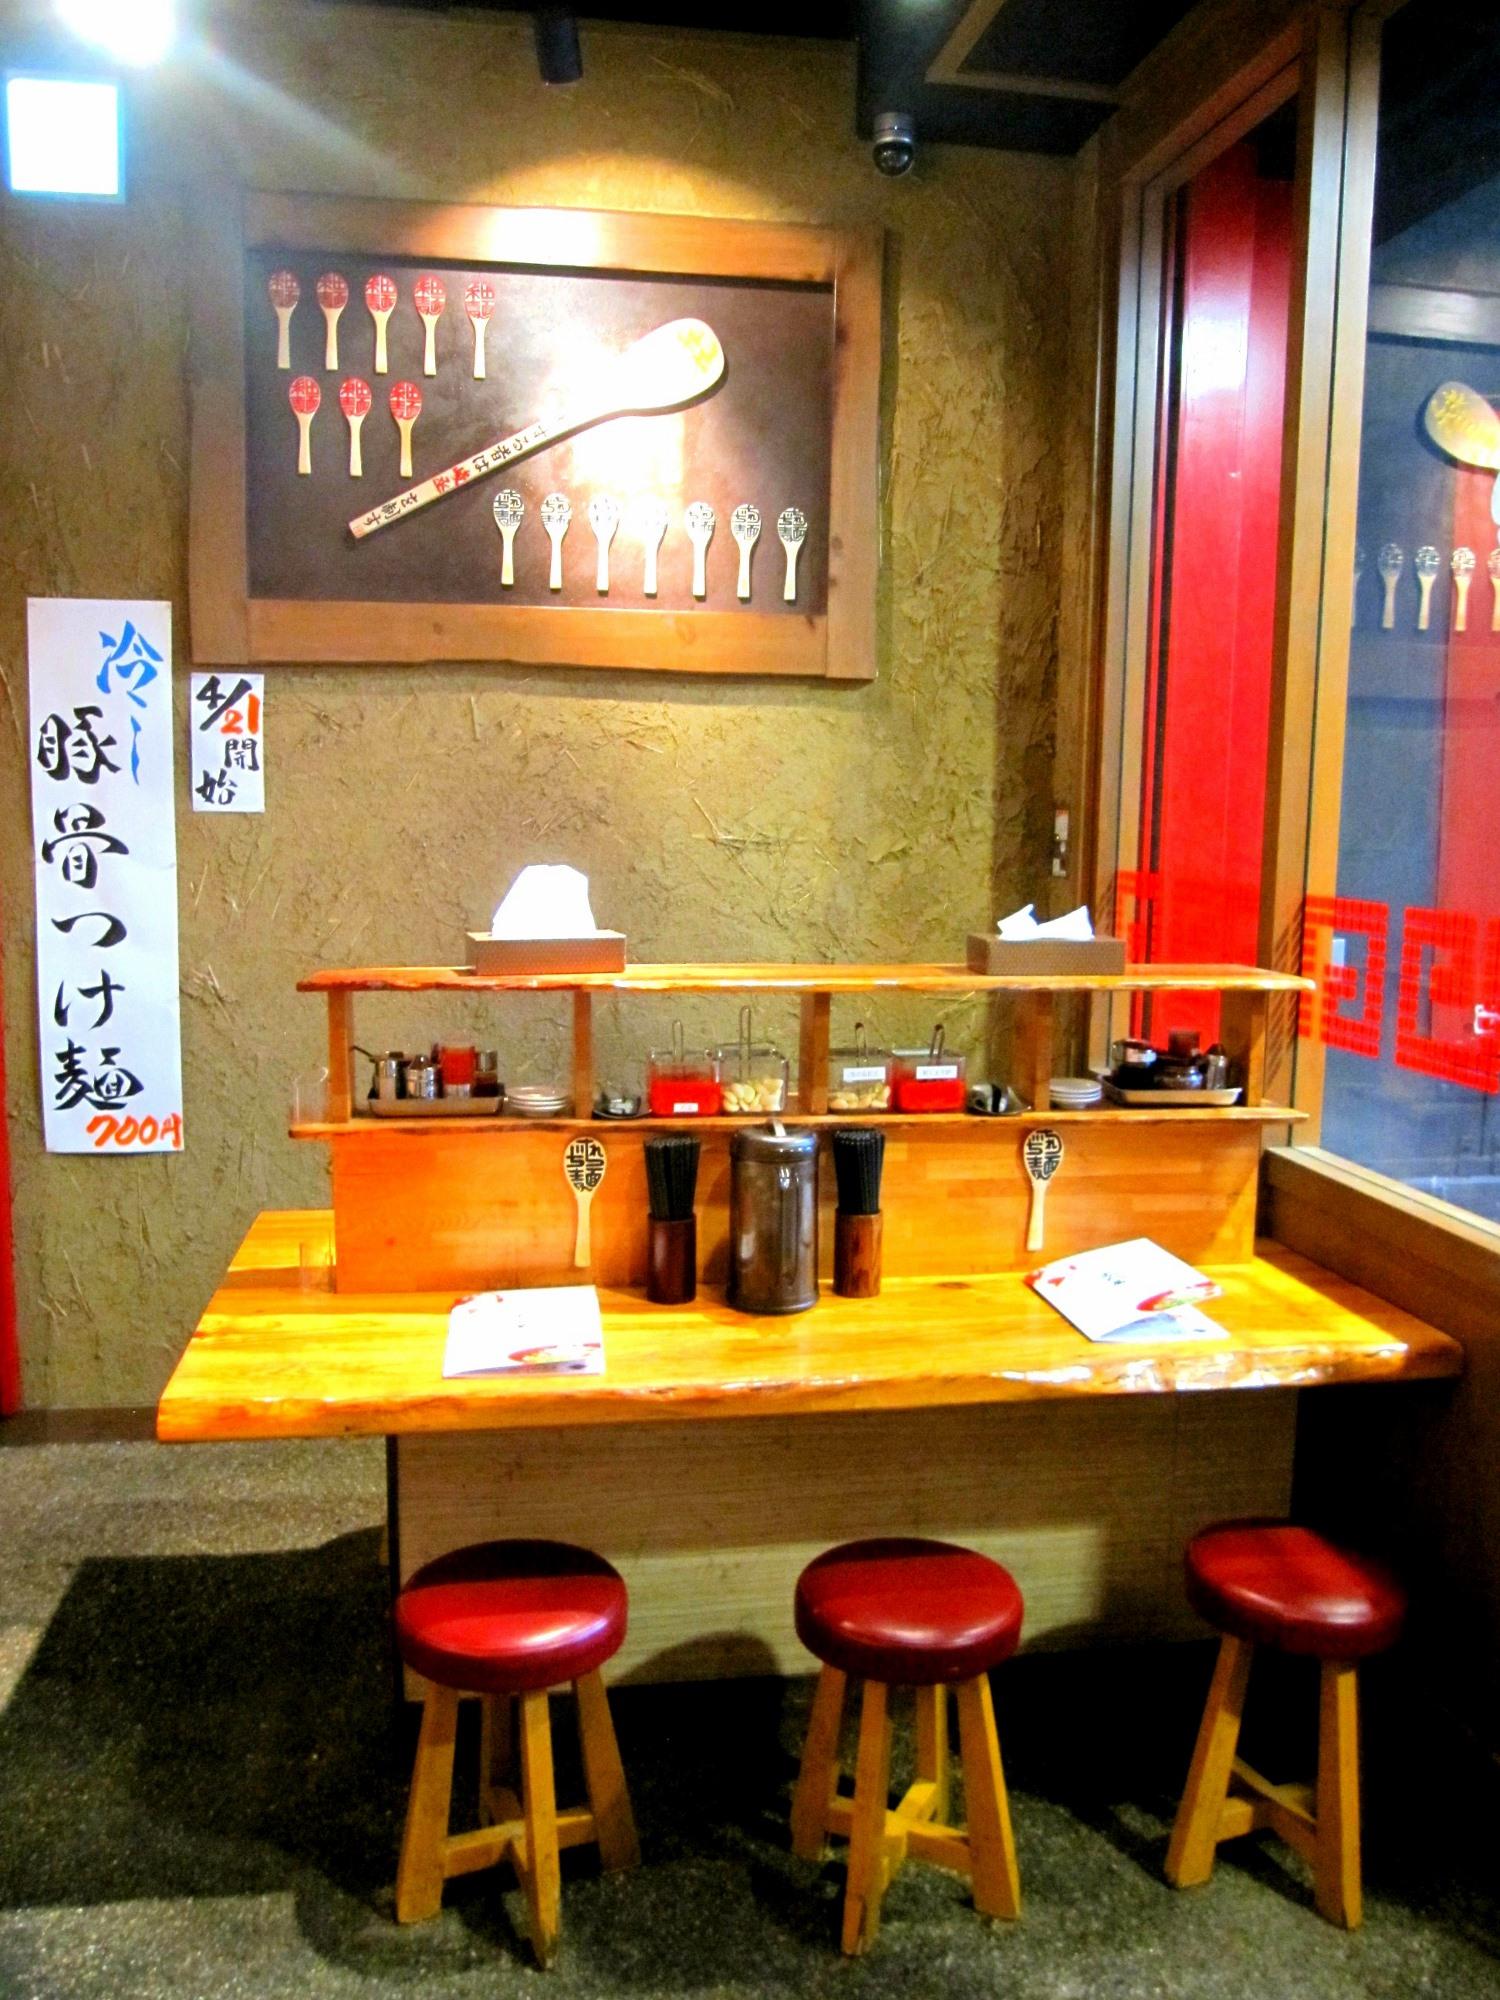 Restaurants nengkoy for Distinctive interior designs